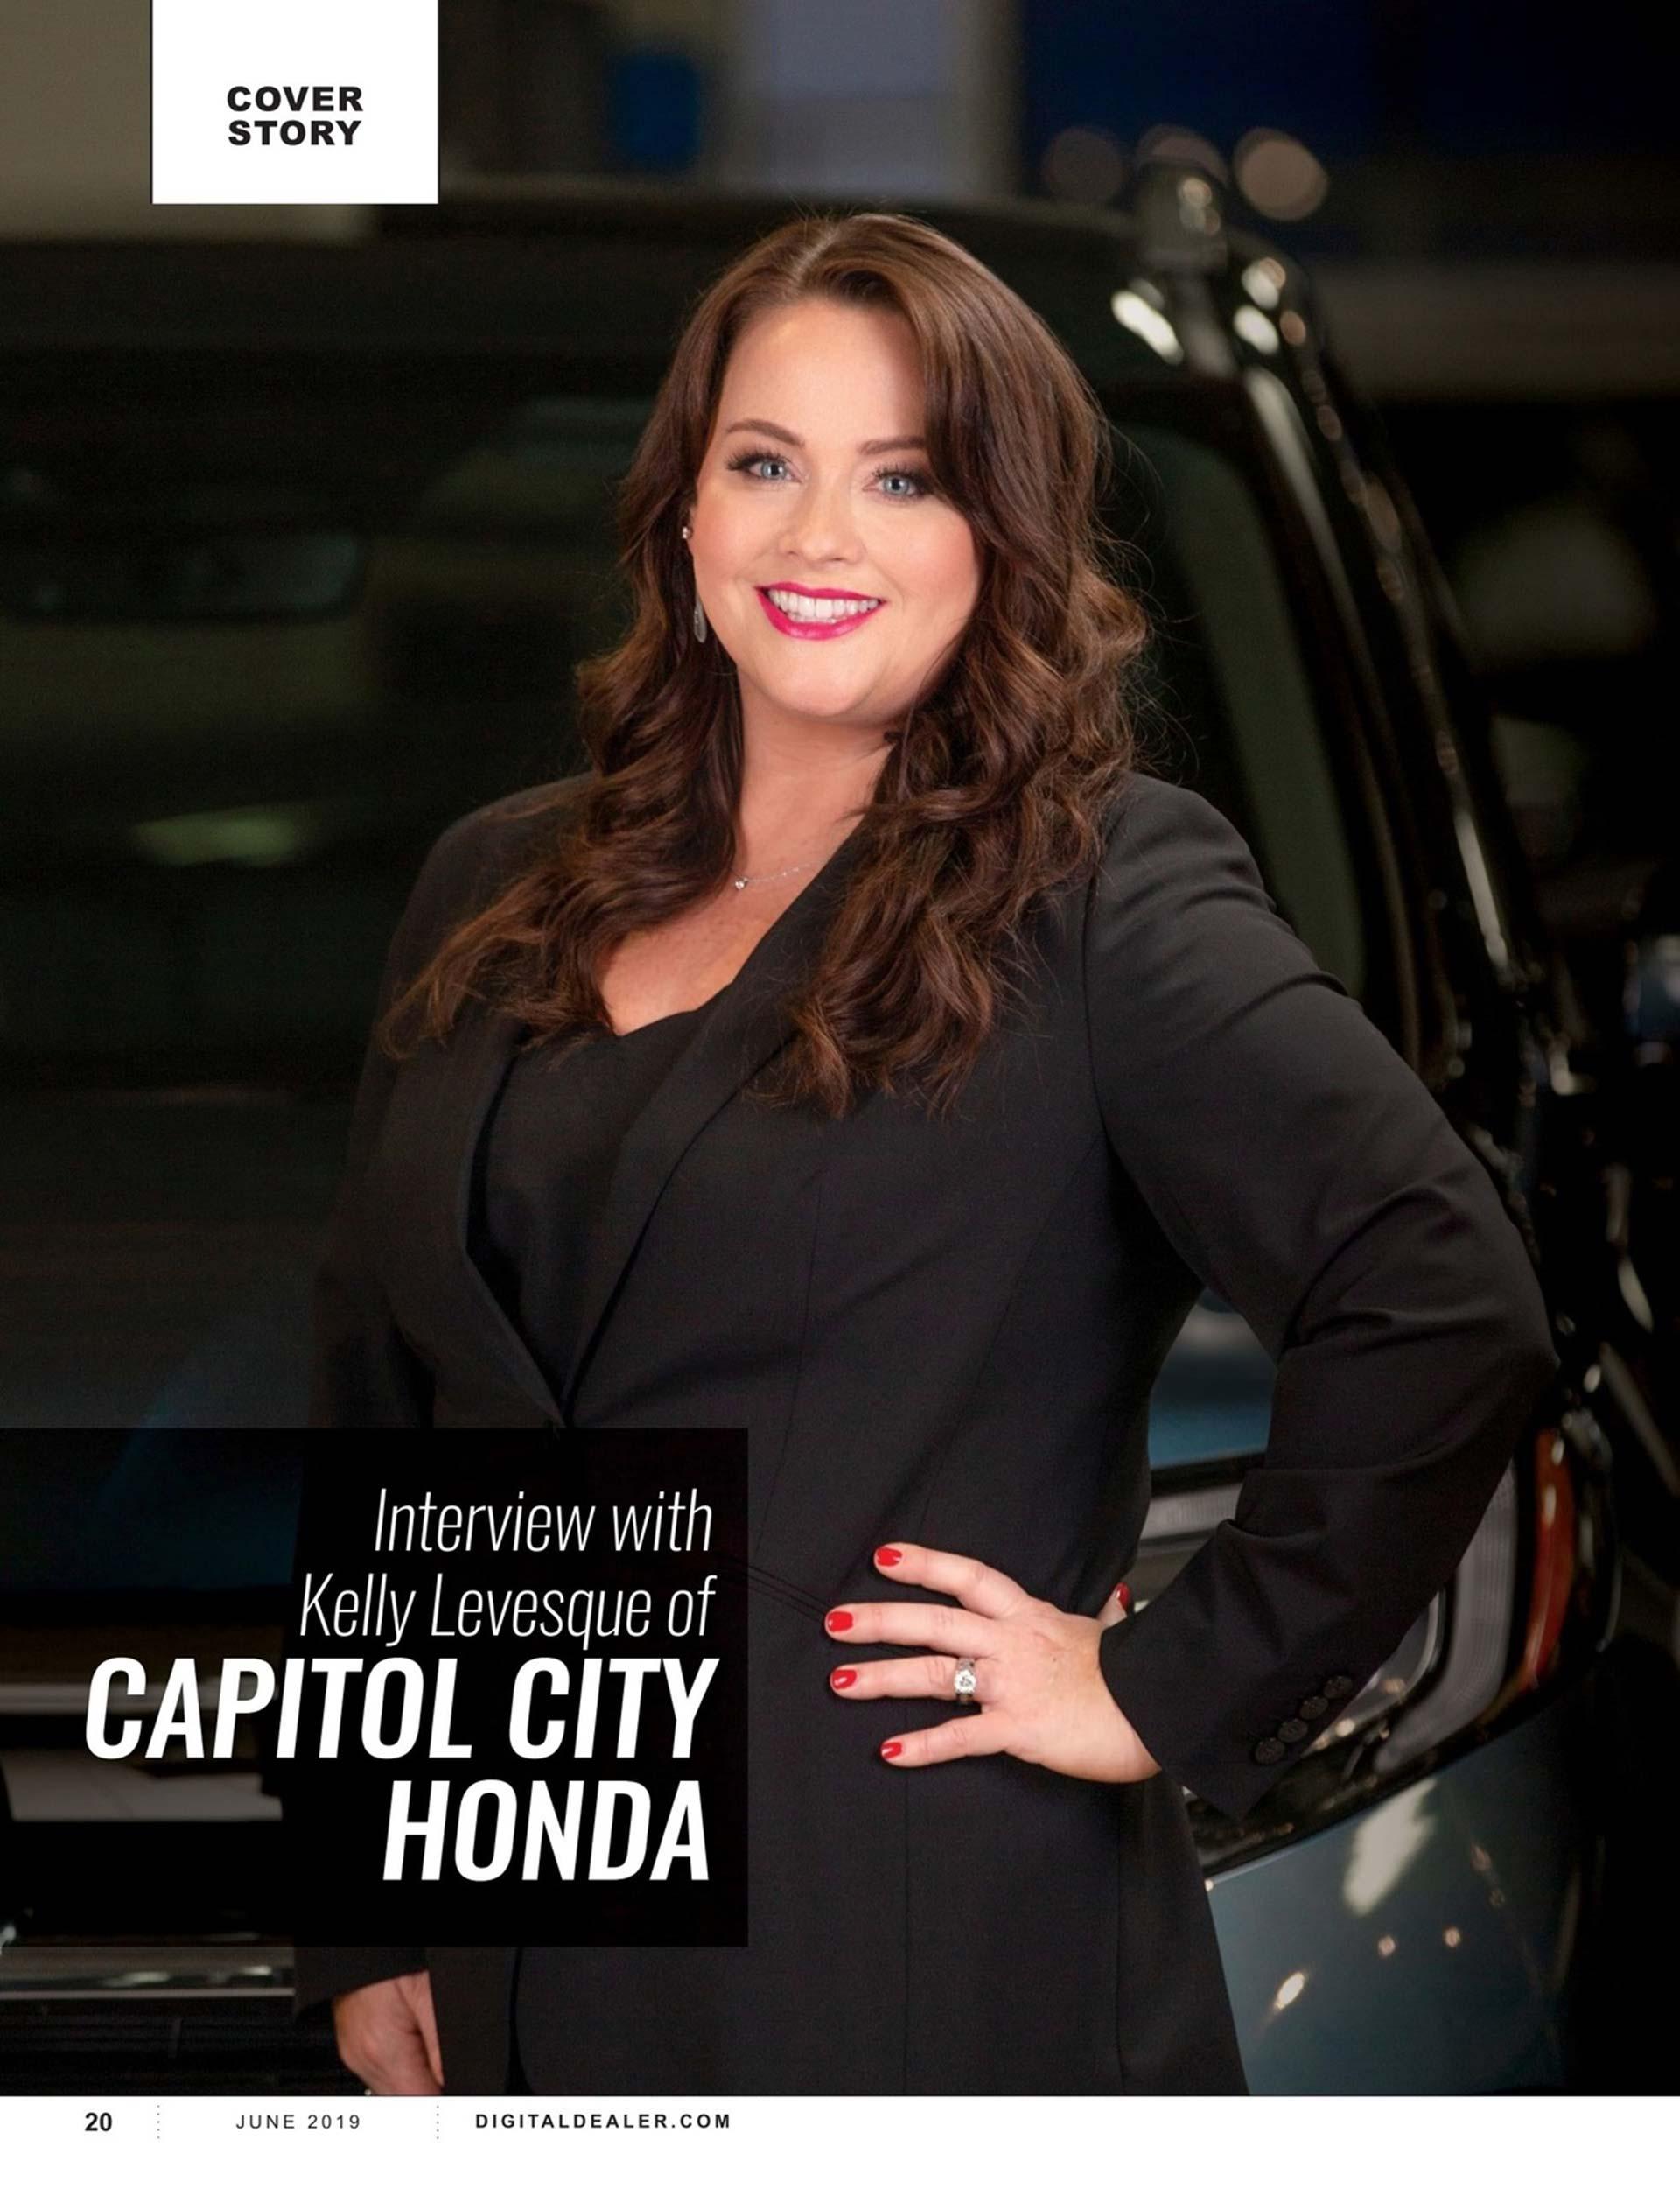 Capitol City Honda in Dealer Magazine 2